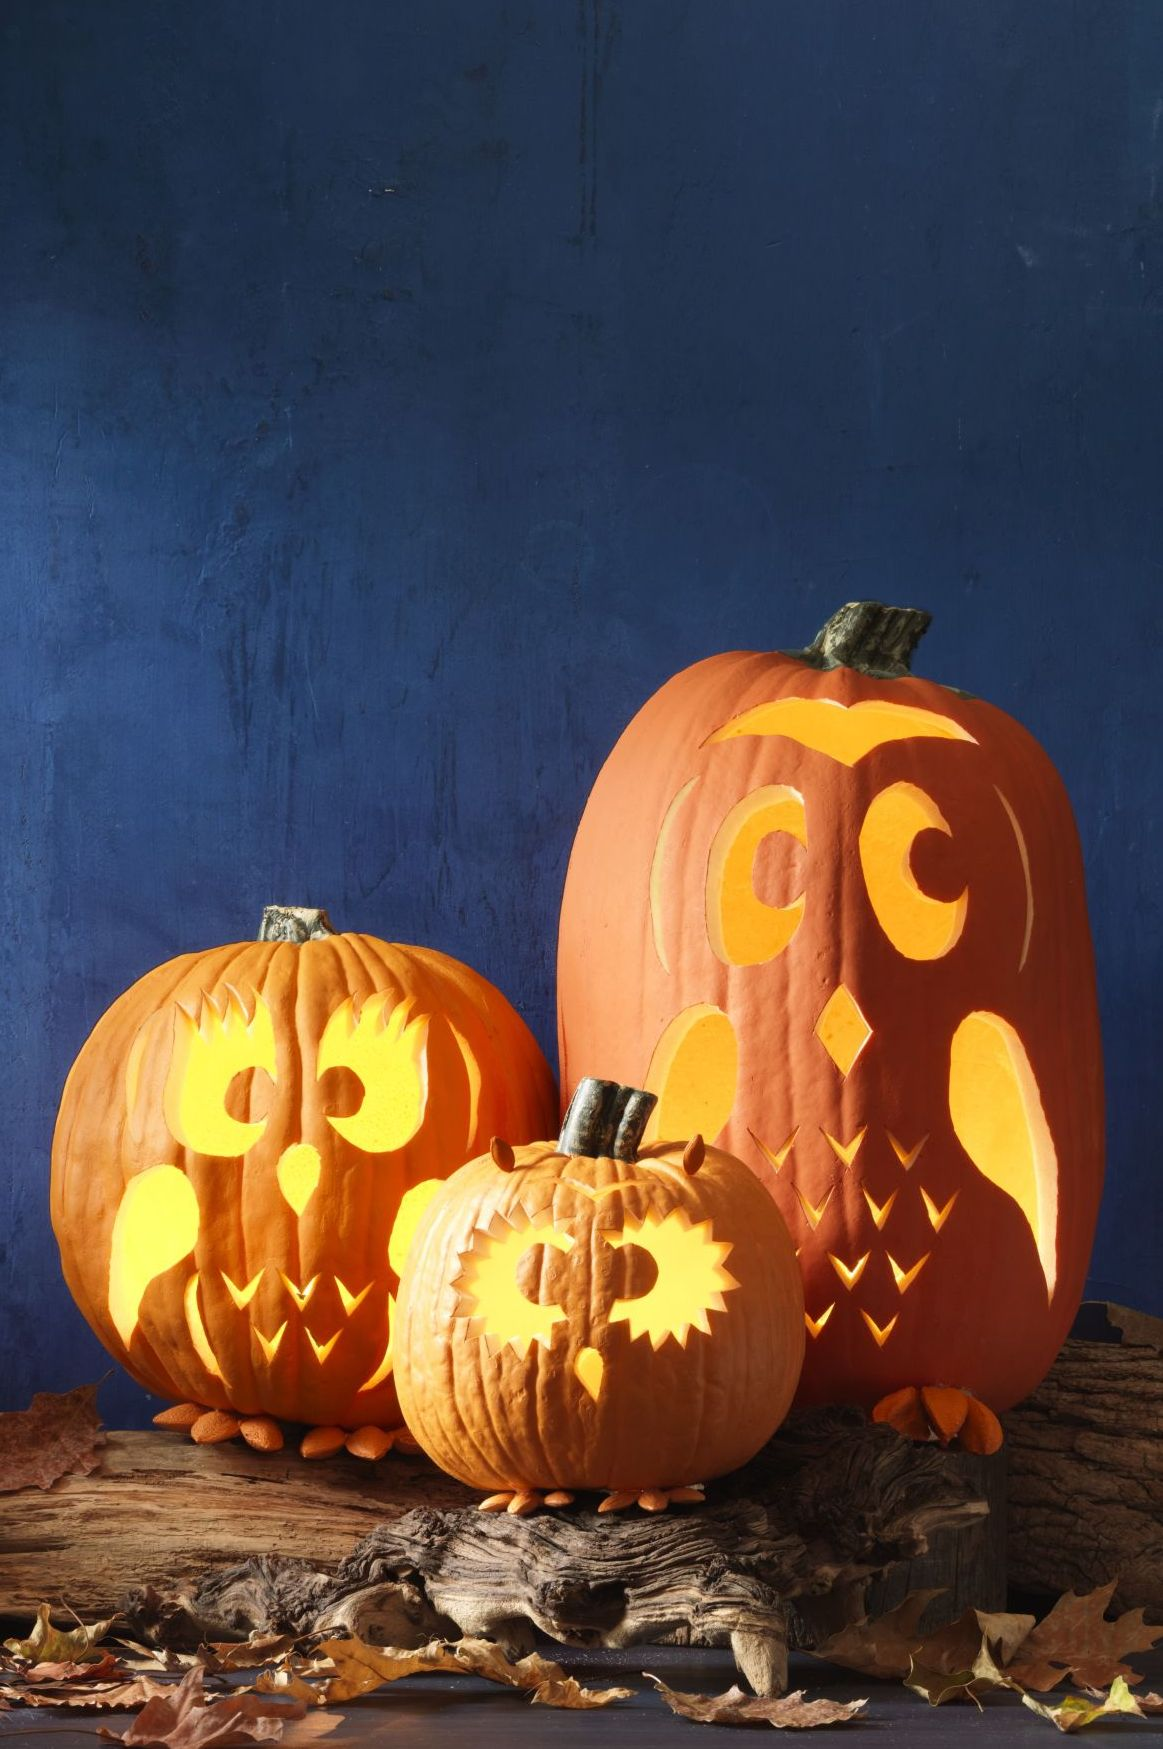 25 Easy Pumpkin Carving Ideas For Halloween 2019 Cool Pumpkin